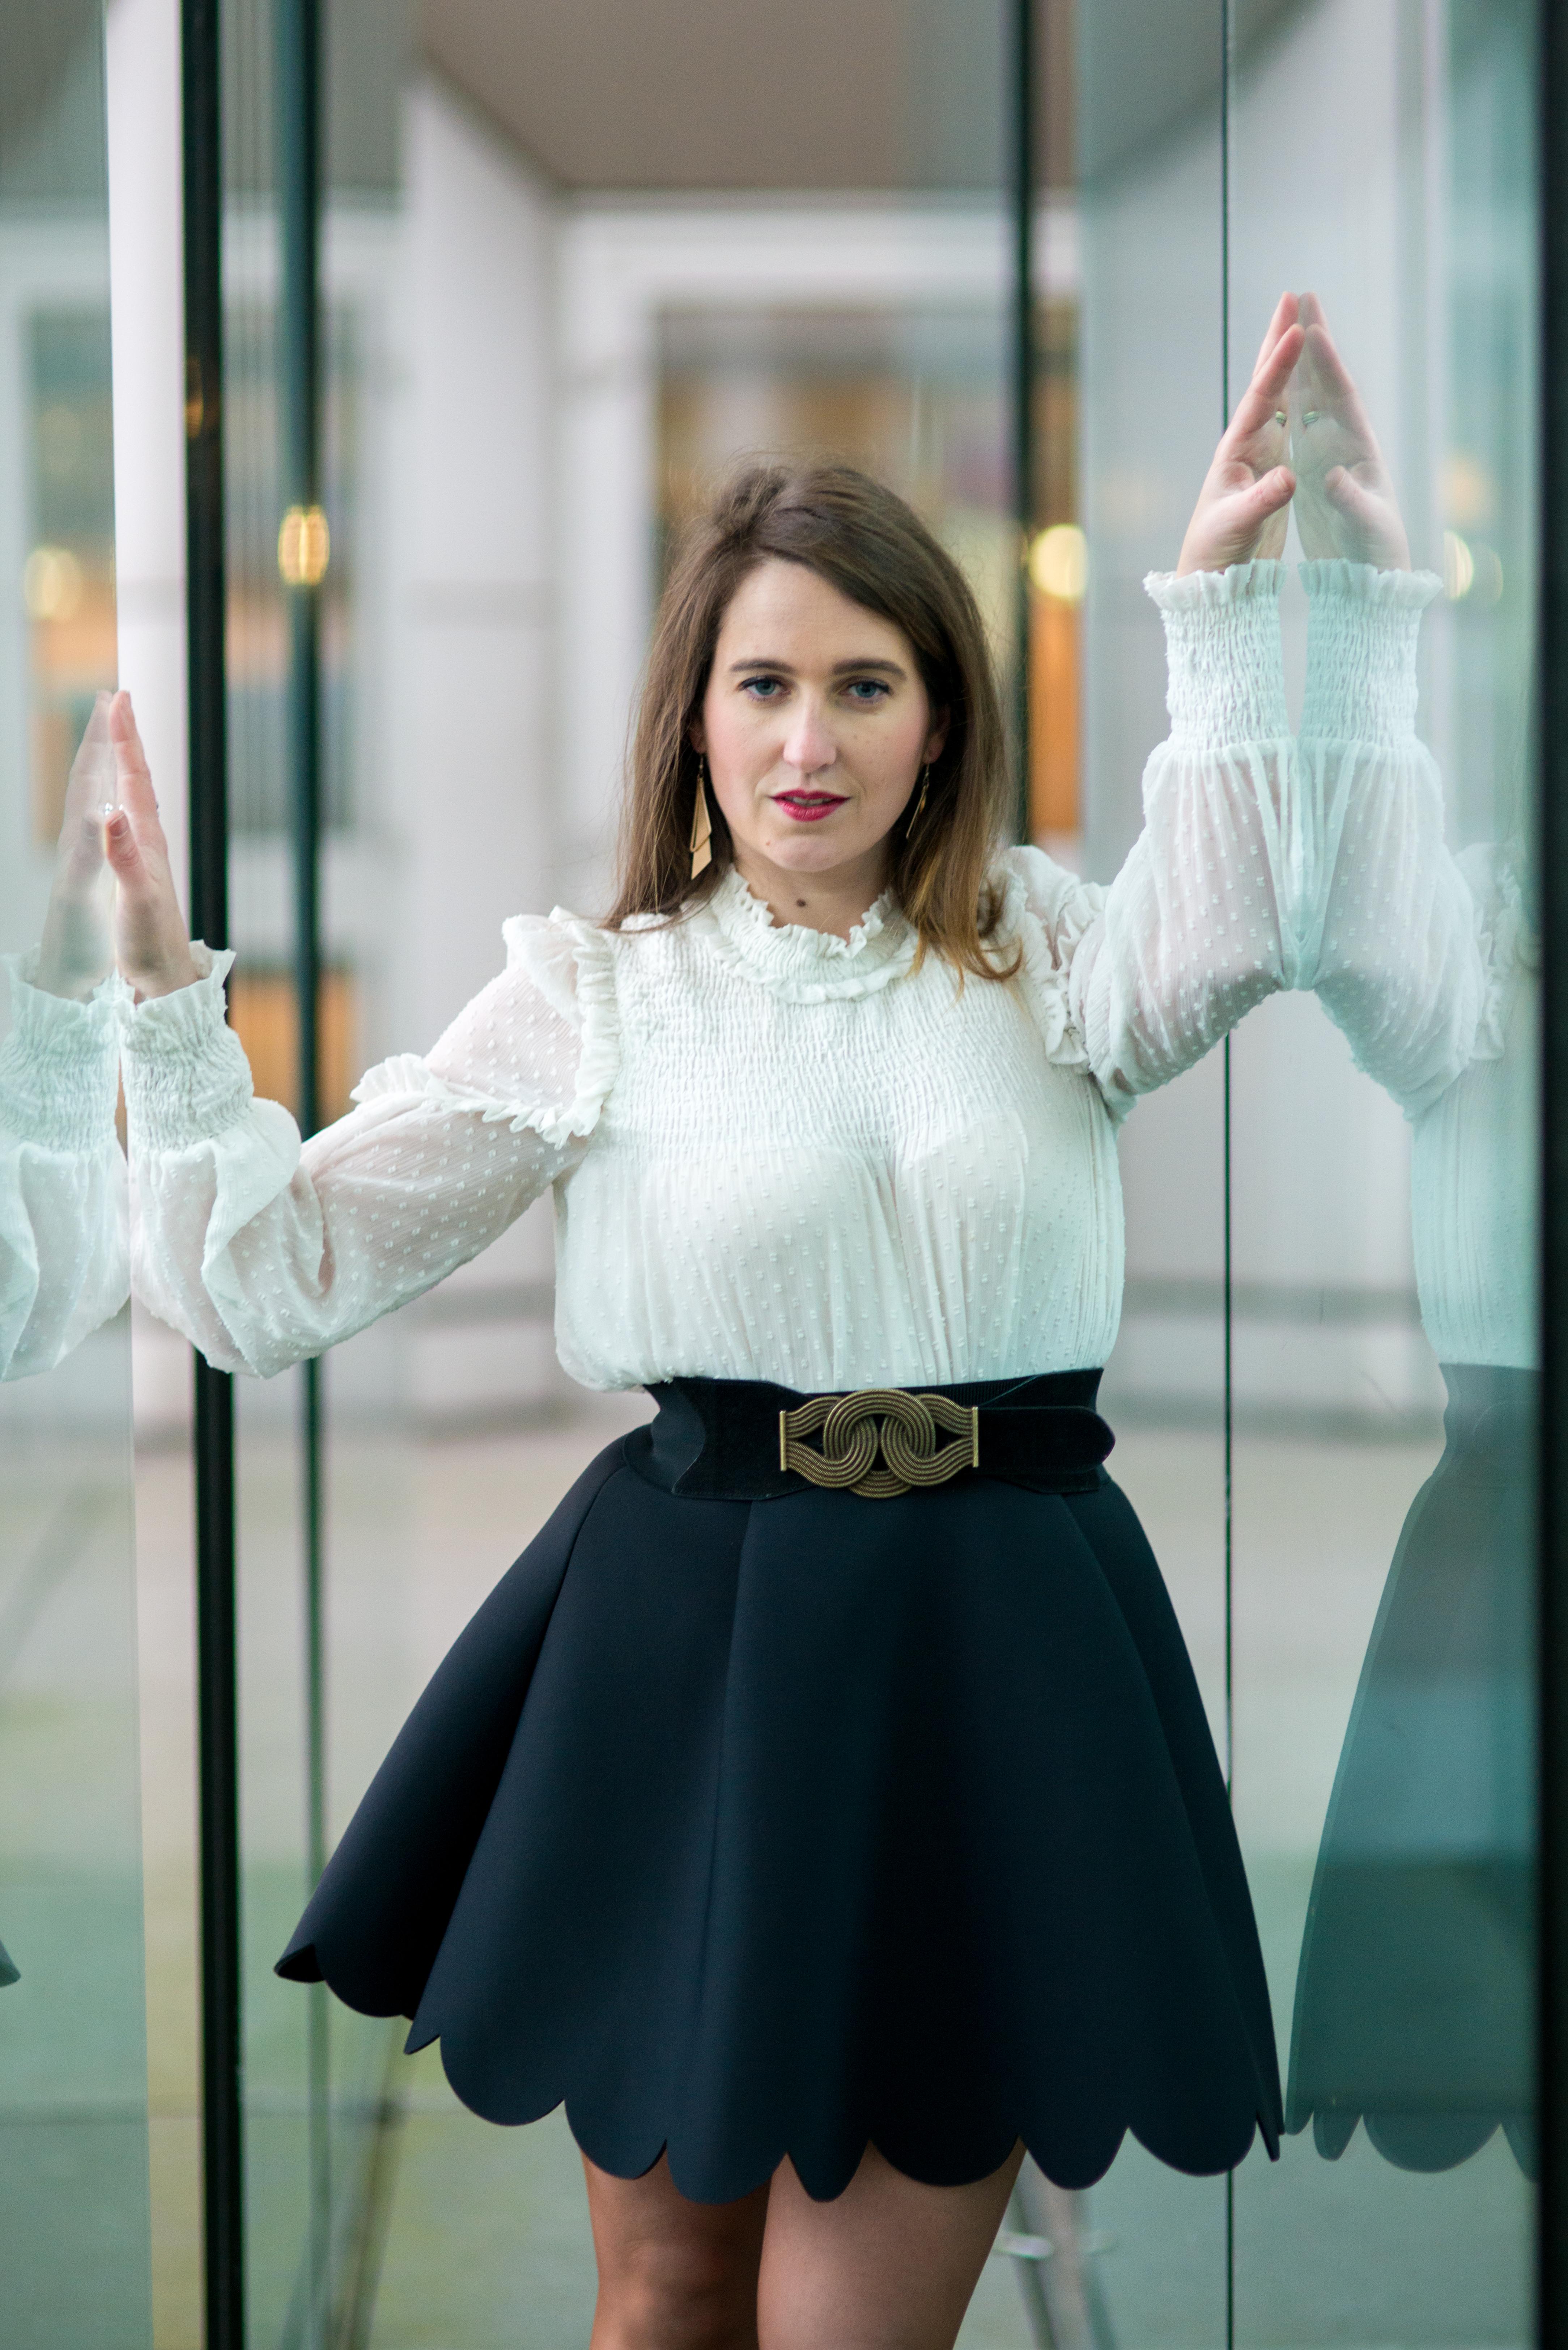 style-sophistique-modele-grandearche-ladefense-paris-fashionblogger-influencer-blouse-zara-seralynepointcom-ump_6765